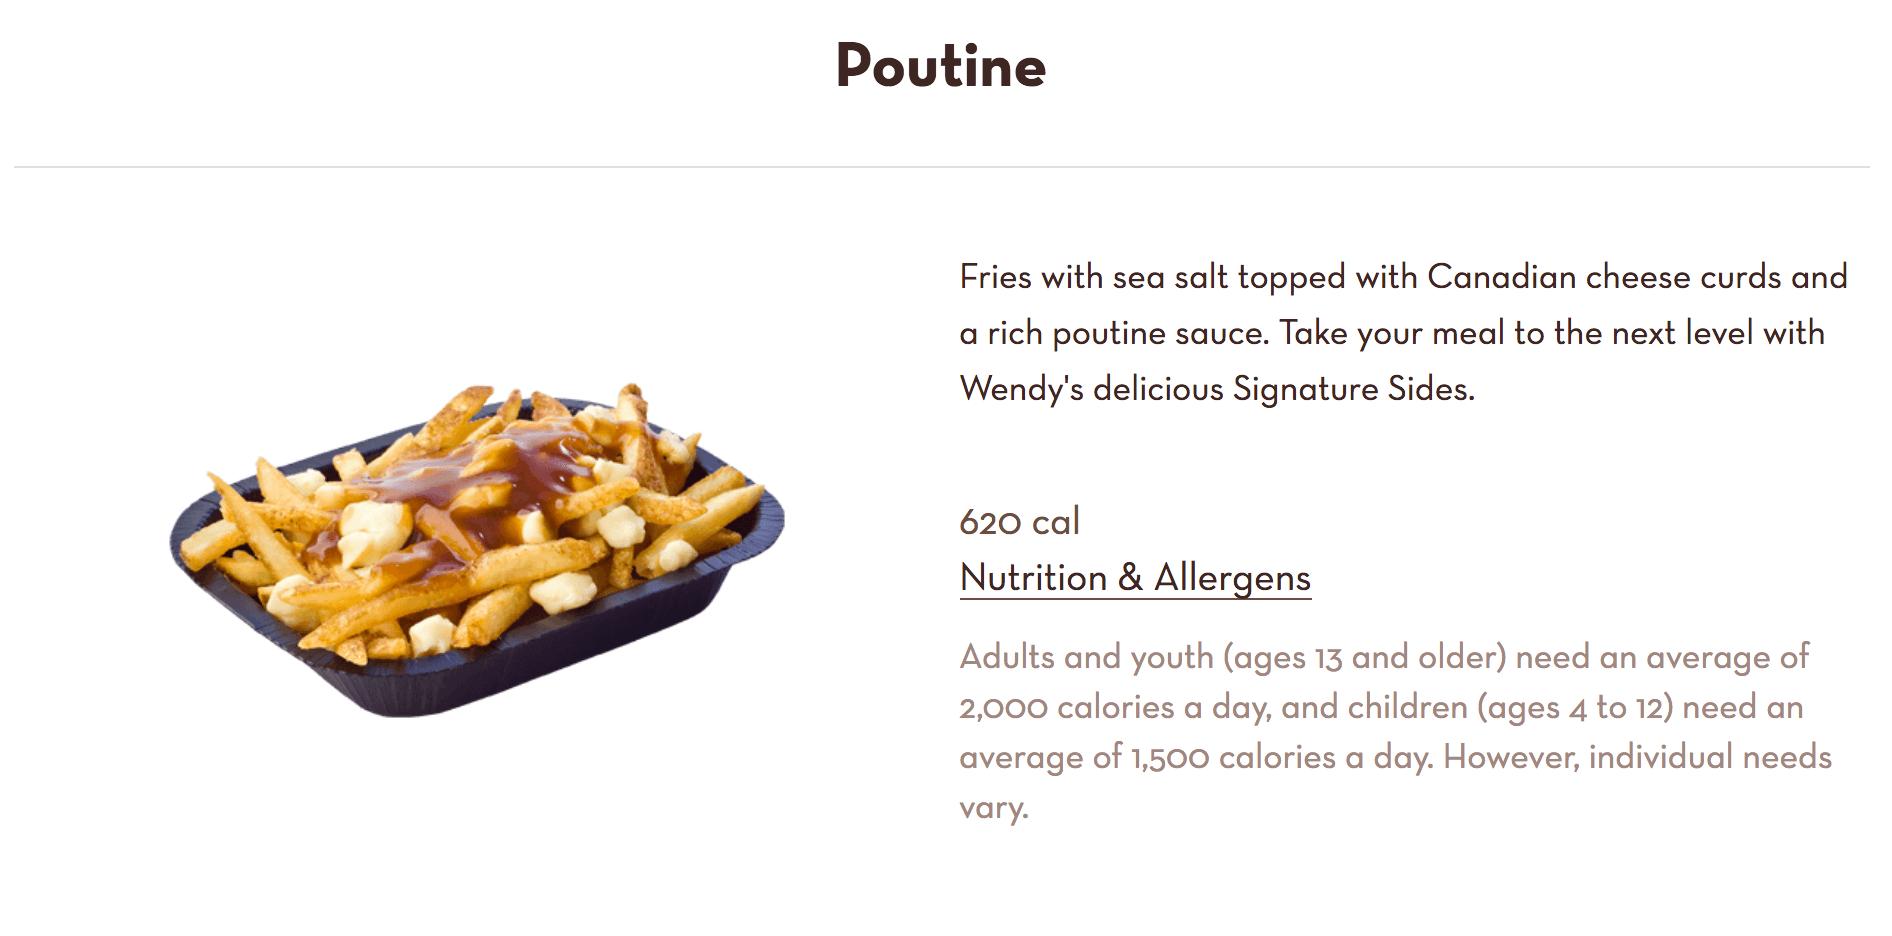 Wendy's poutine sauce